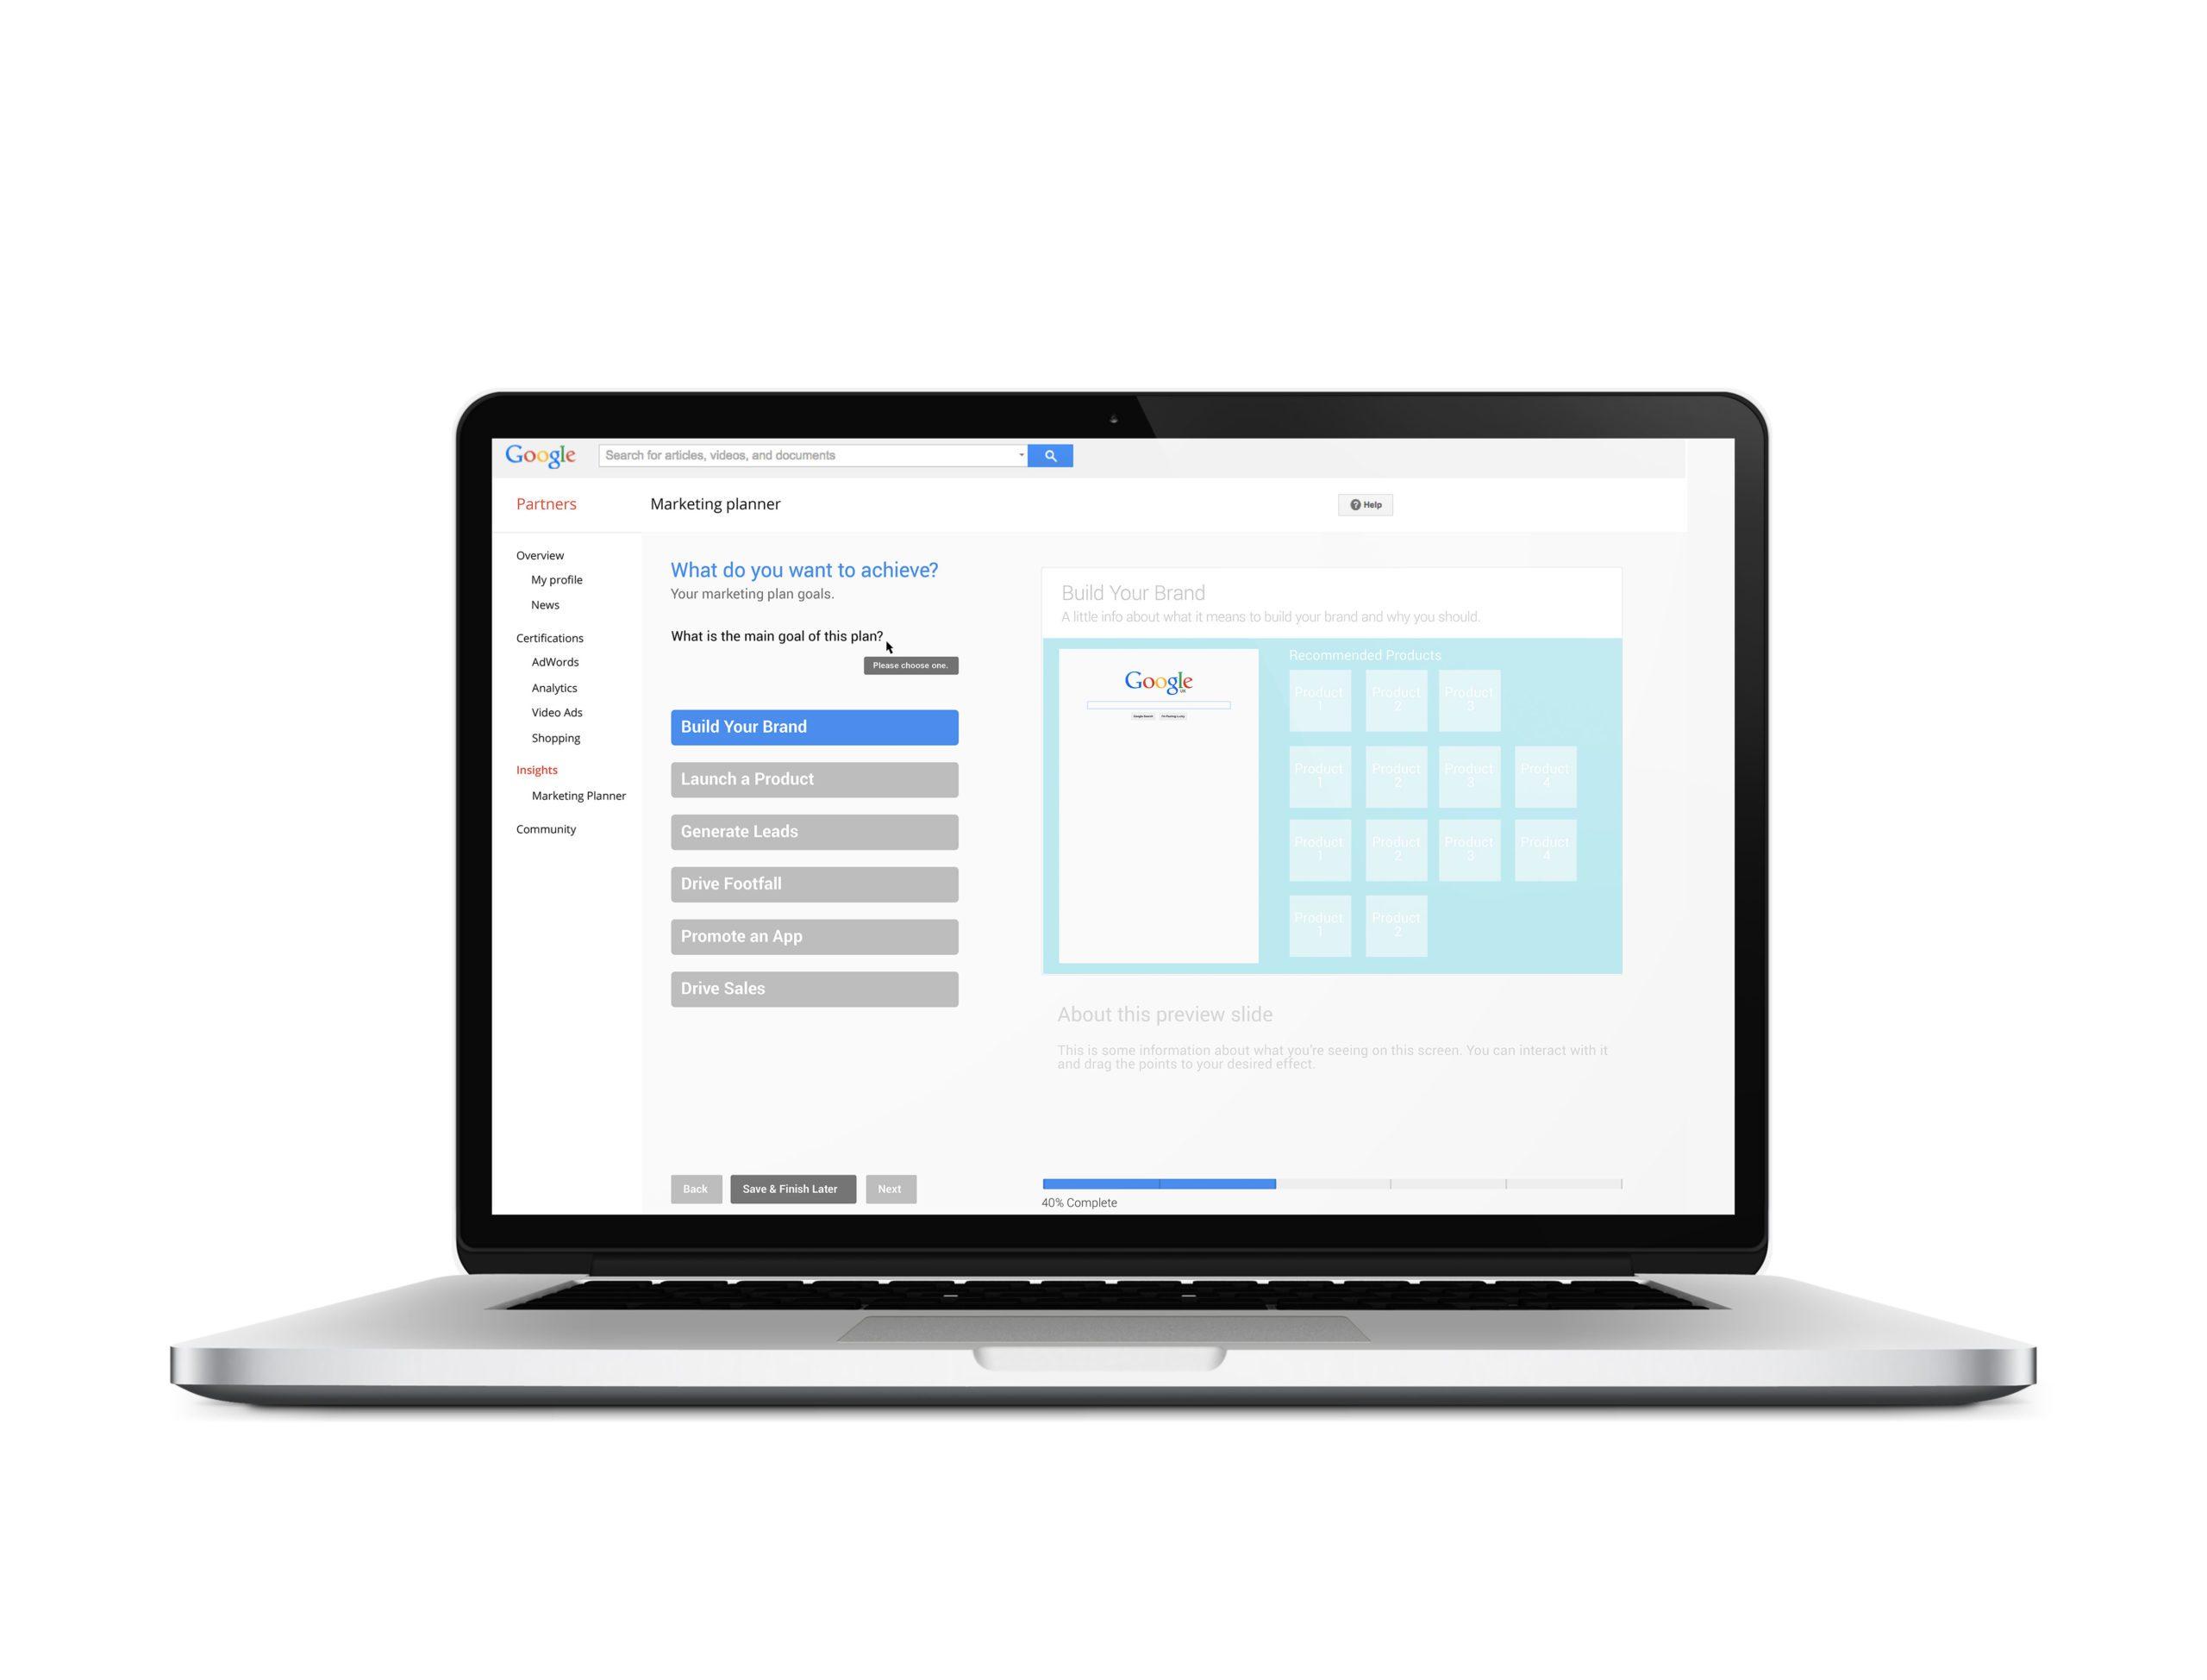 google-marketing-planner-macbook-screen3